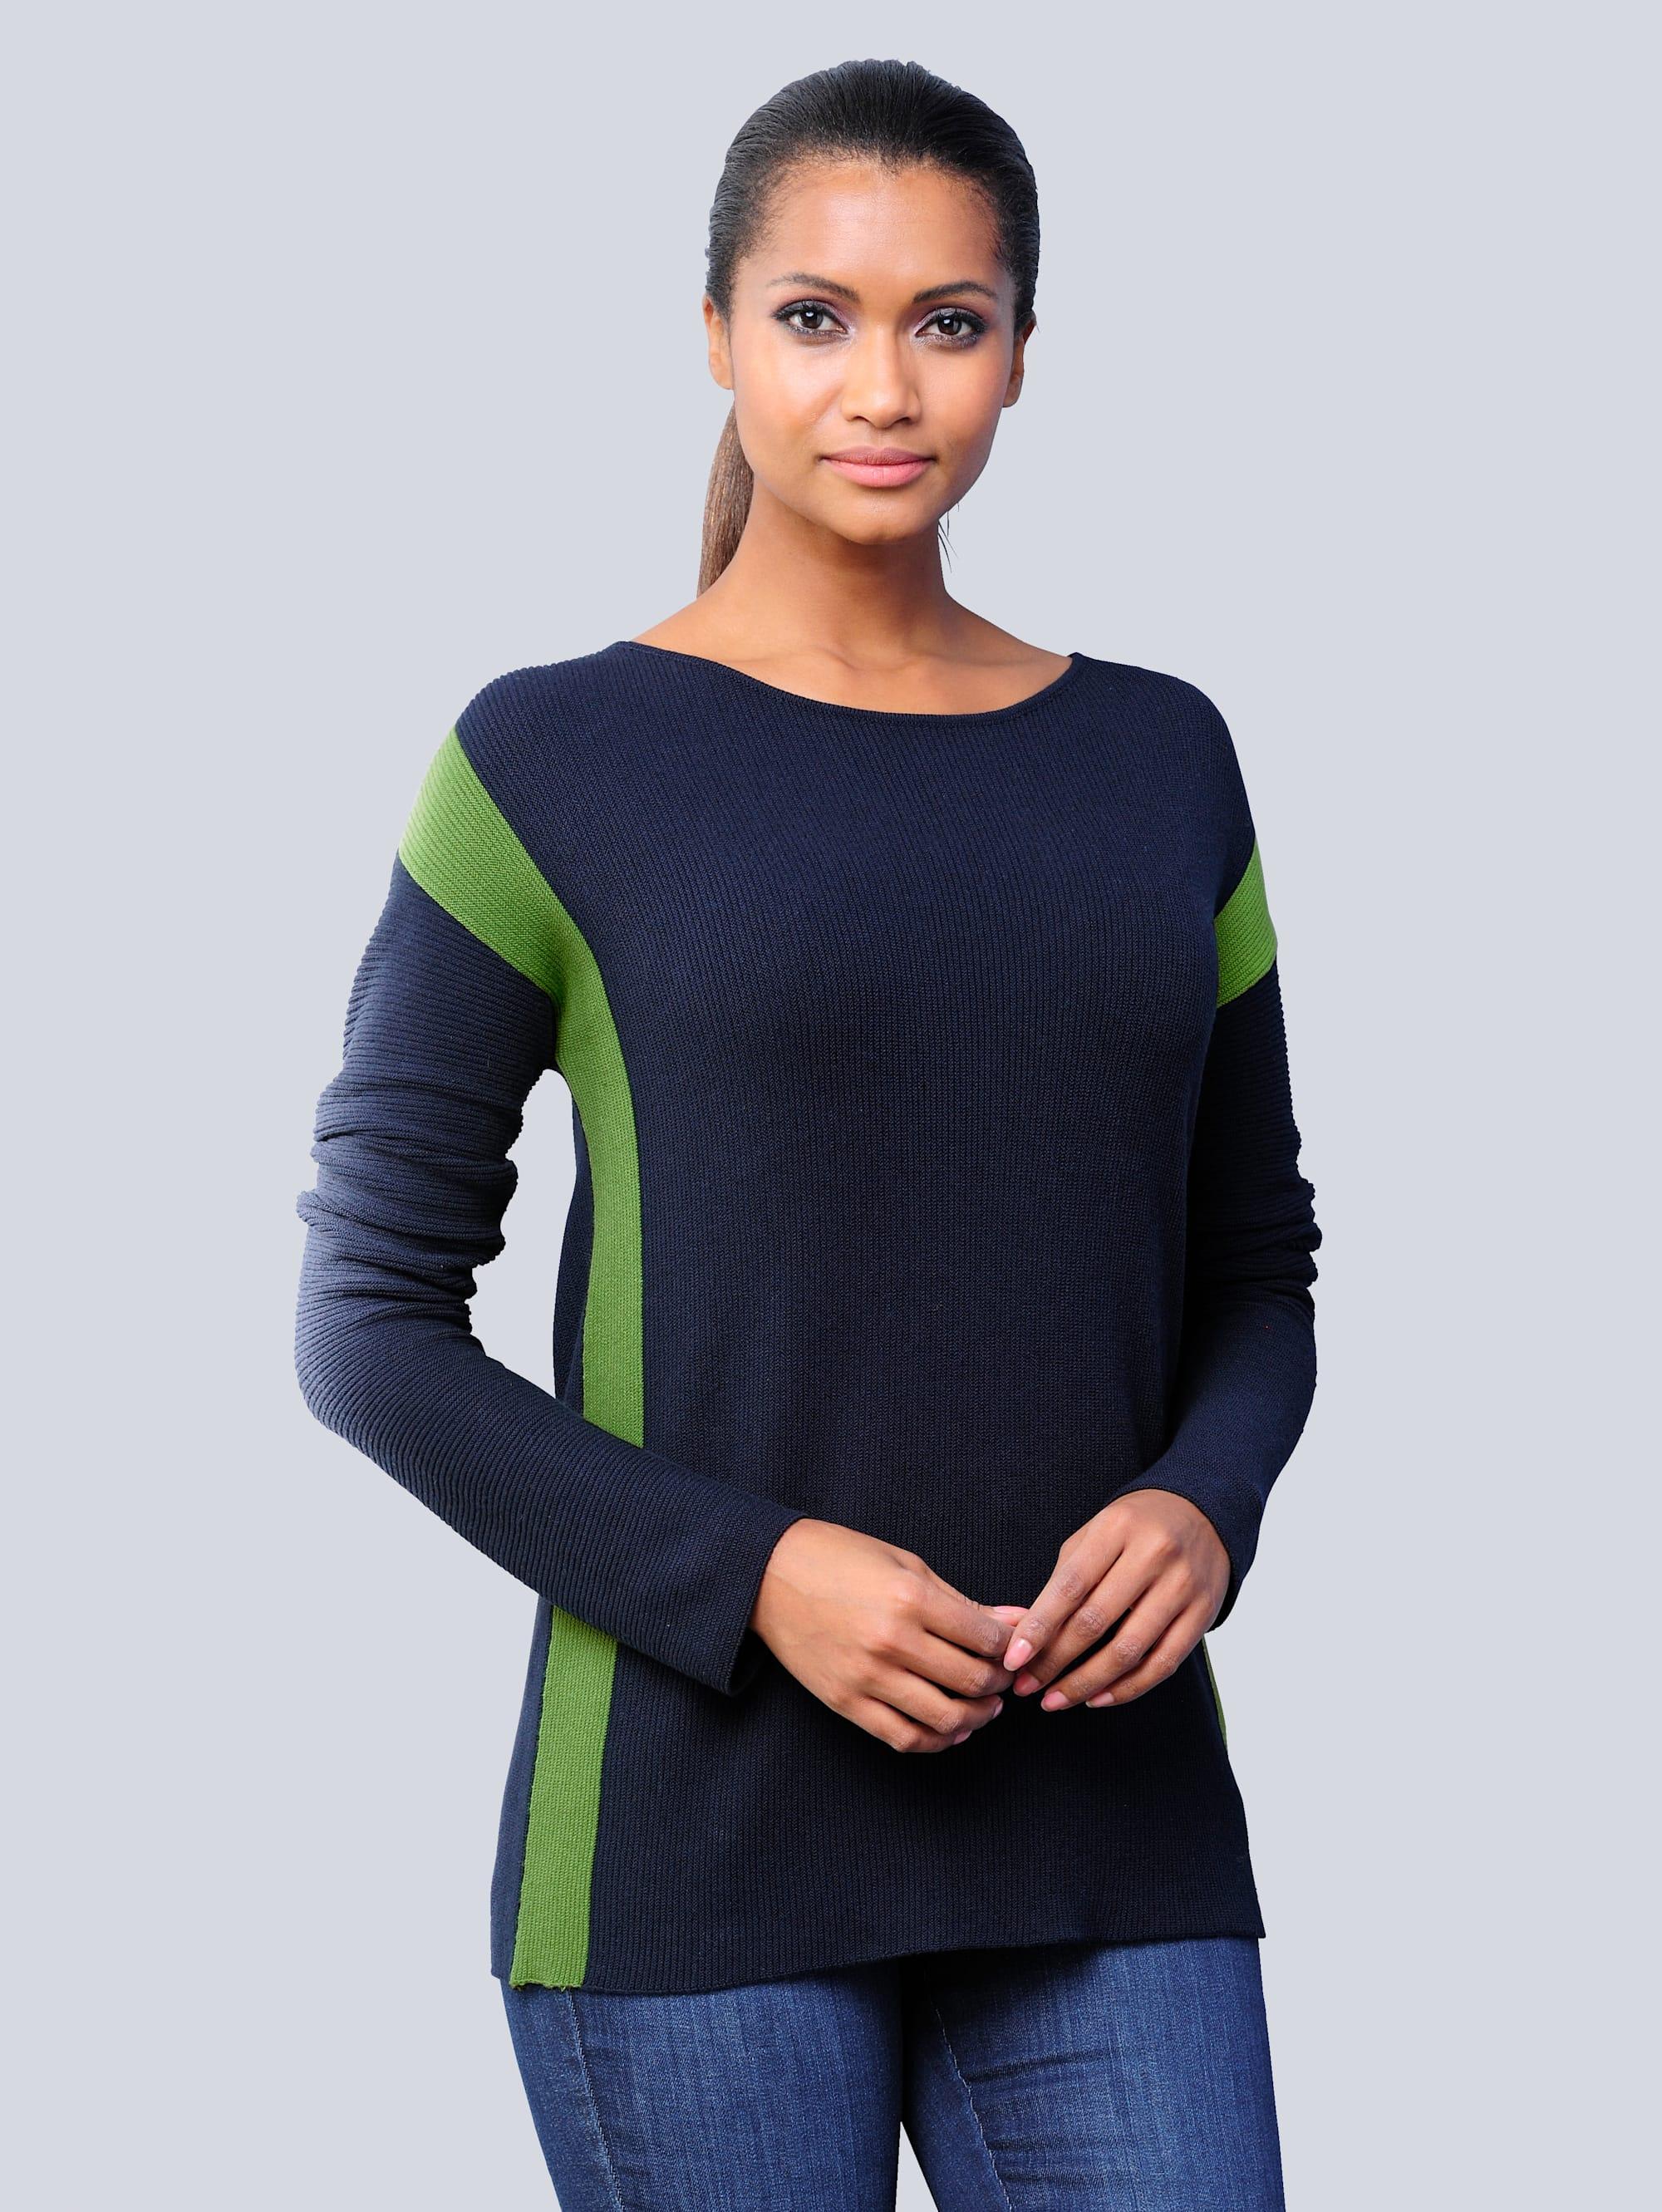 Alba Moda Pullover mit kontrastfarbigen Blockstreifen HaB7t 1qRwQ